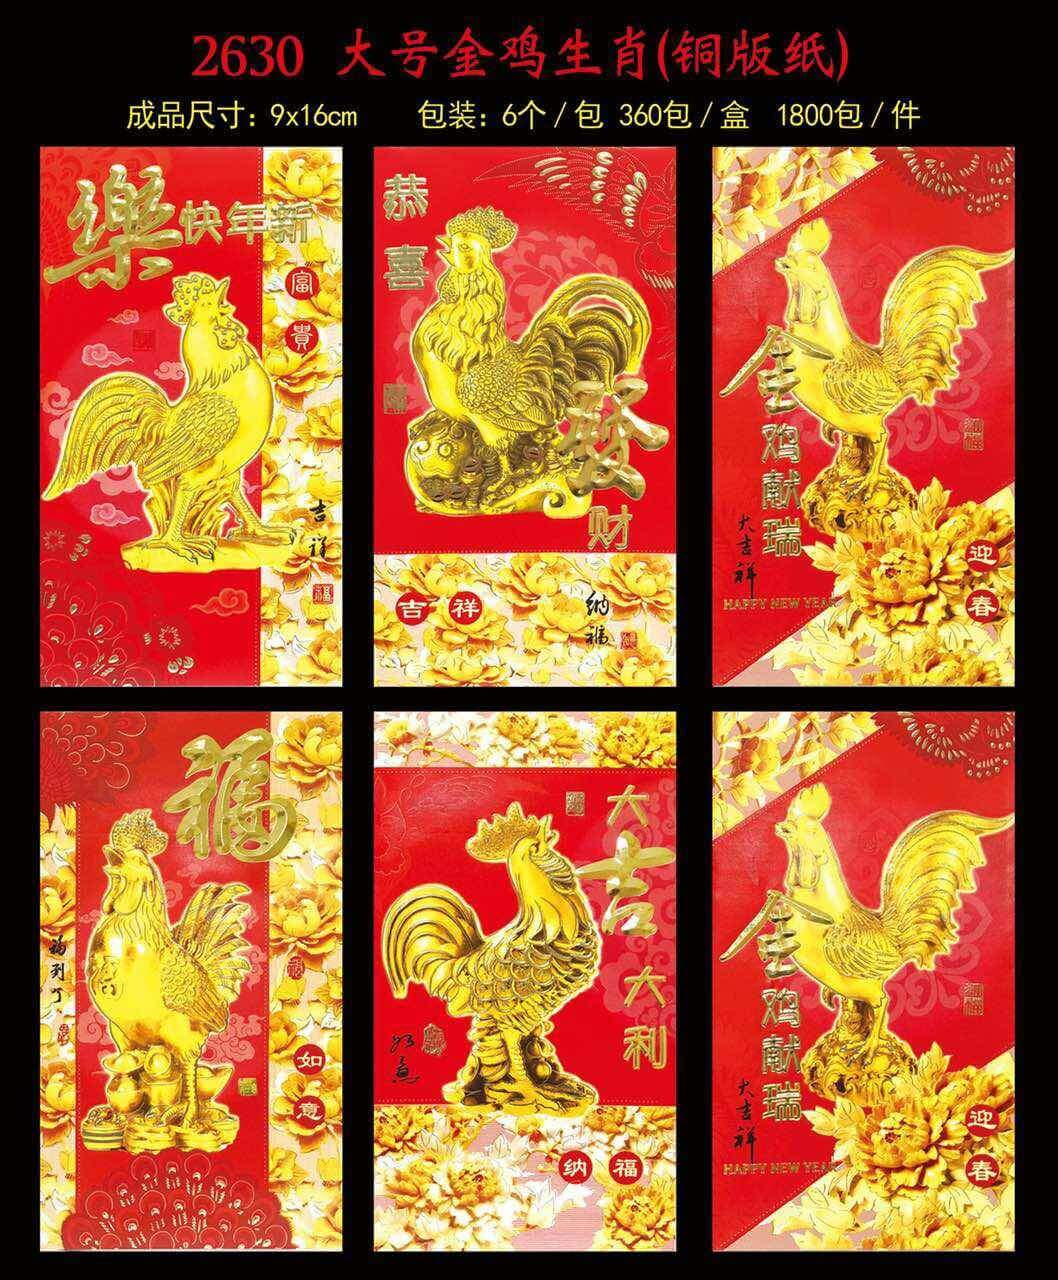 Jual Angpau Imlek 2630 Isi 6 Buah Tahun Ayam Angbao Angpao Ampau 1 Paket Murah Dooroyls Grand Tokopedia